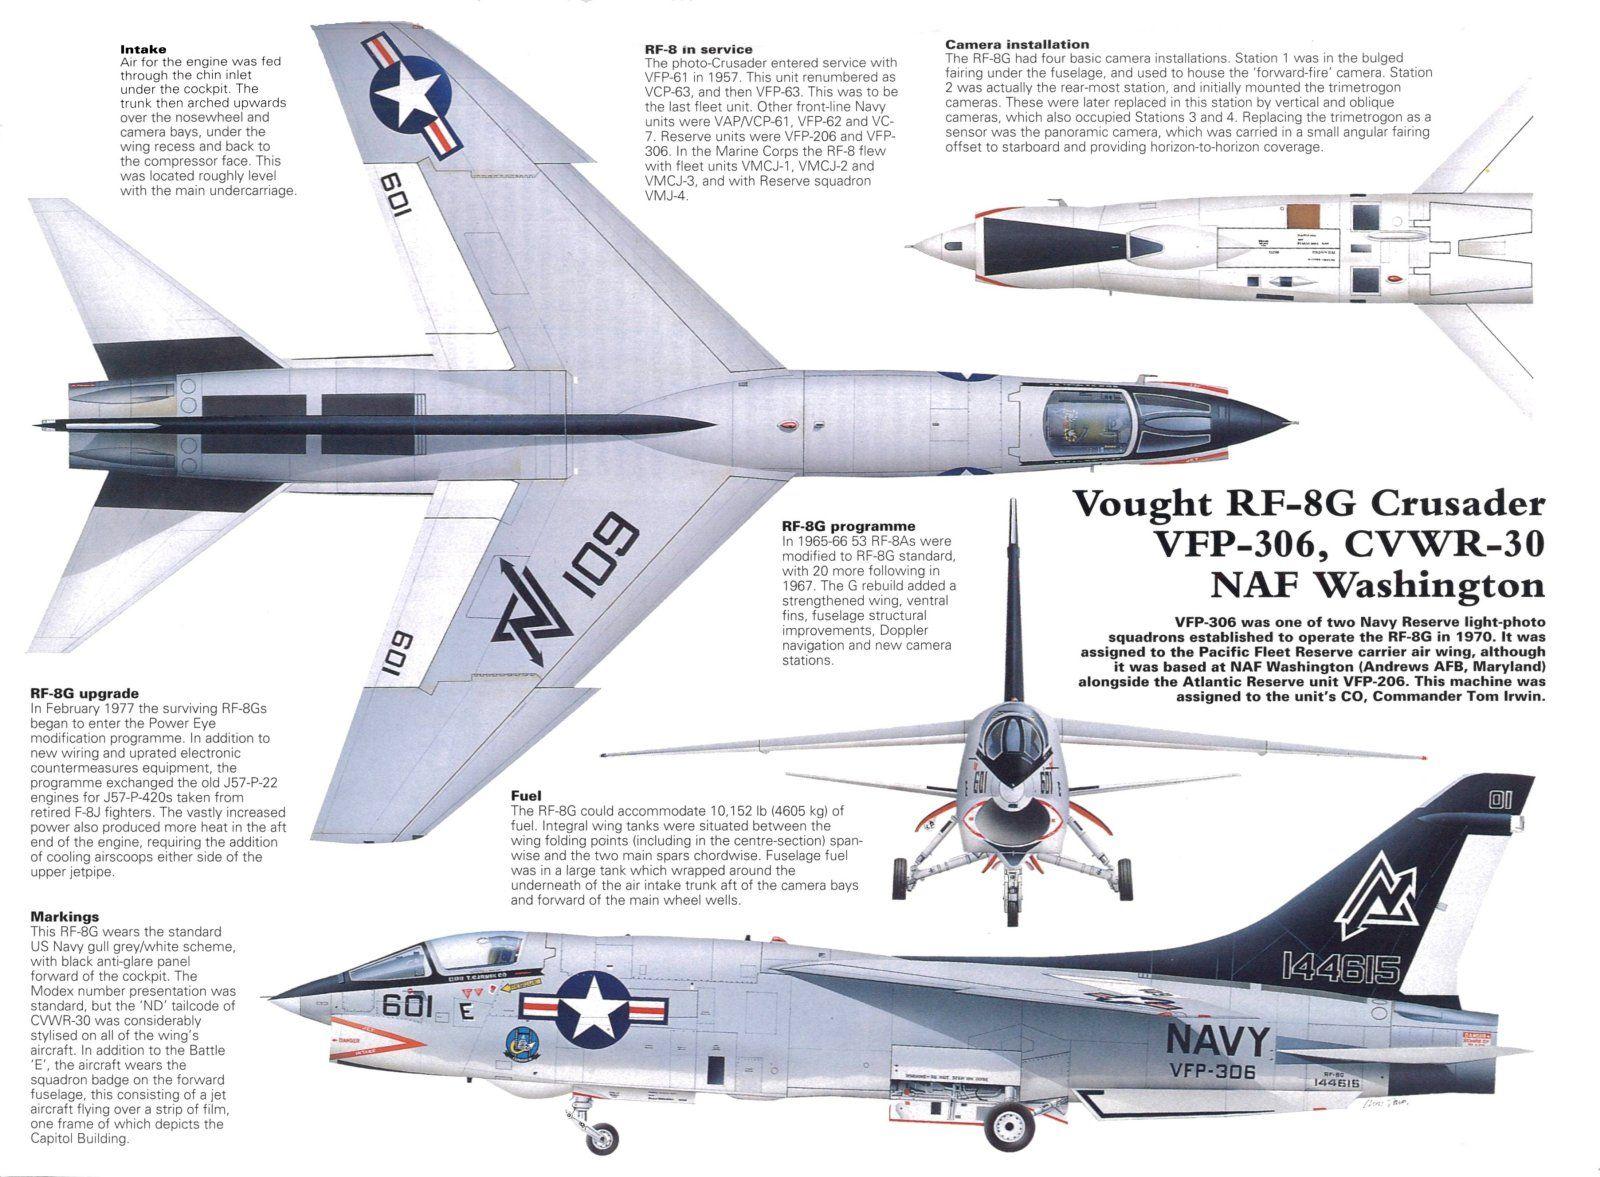 Aircraft Landing Gear Wiring Diagram Electrical F 111 Carrier Diagrams Schemes Alternator Symbols